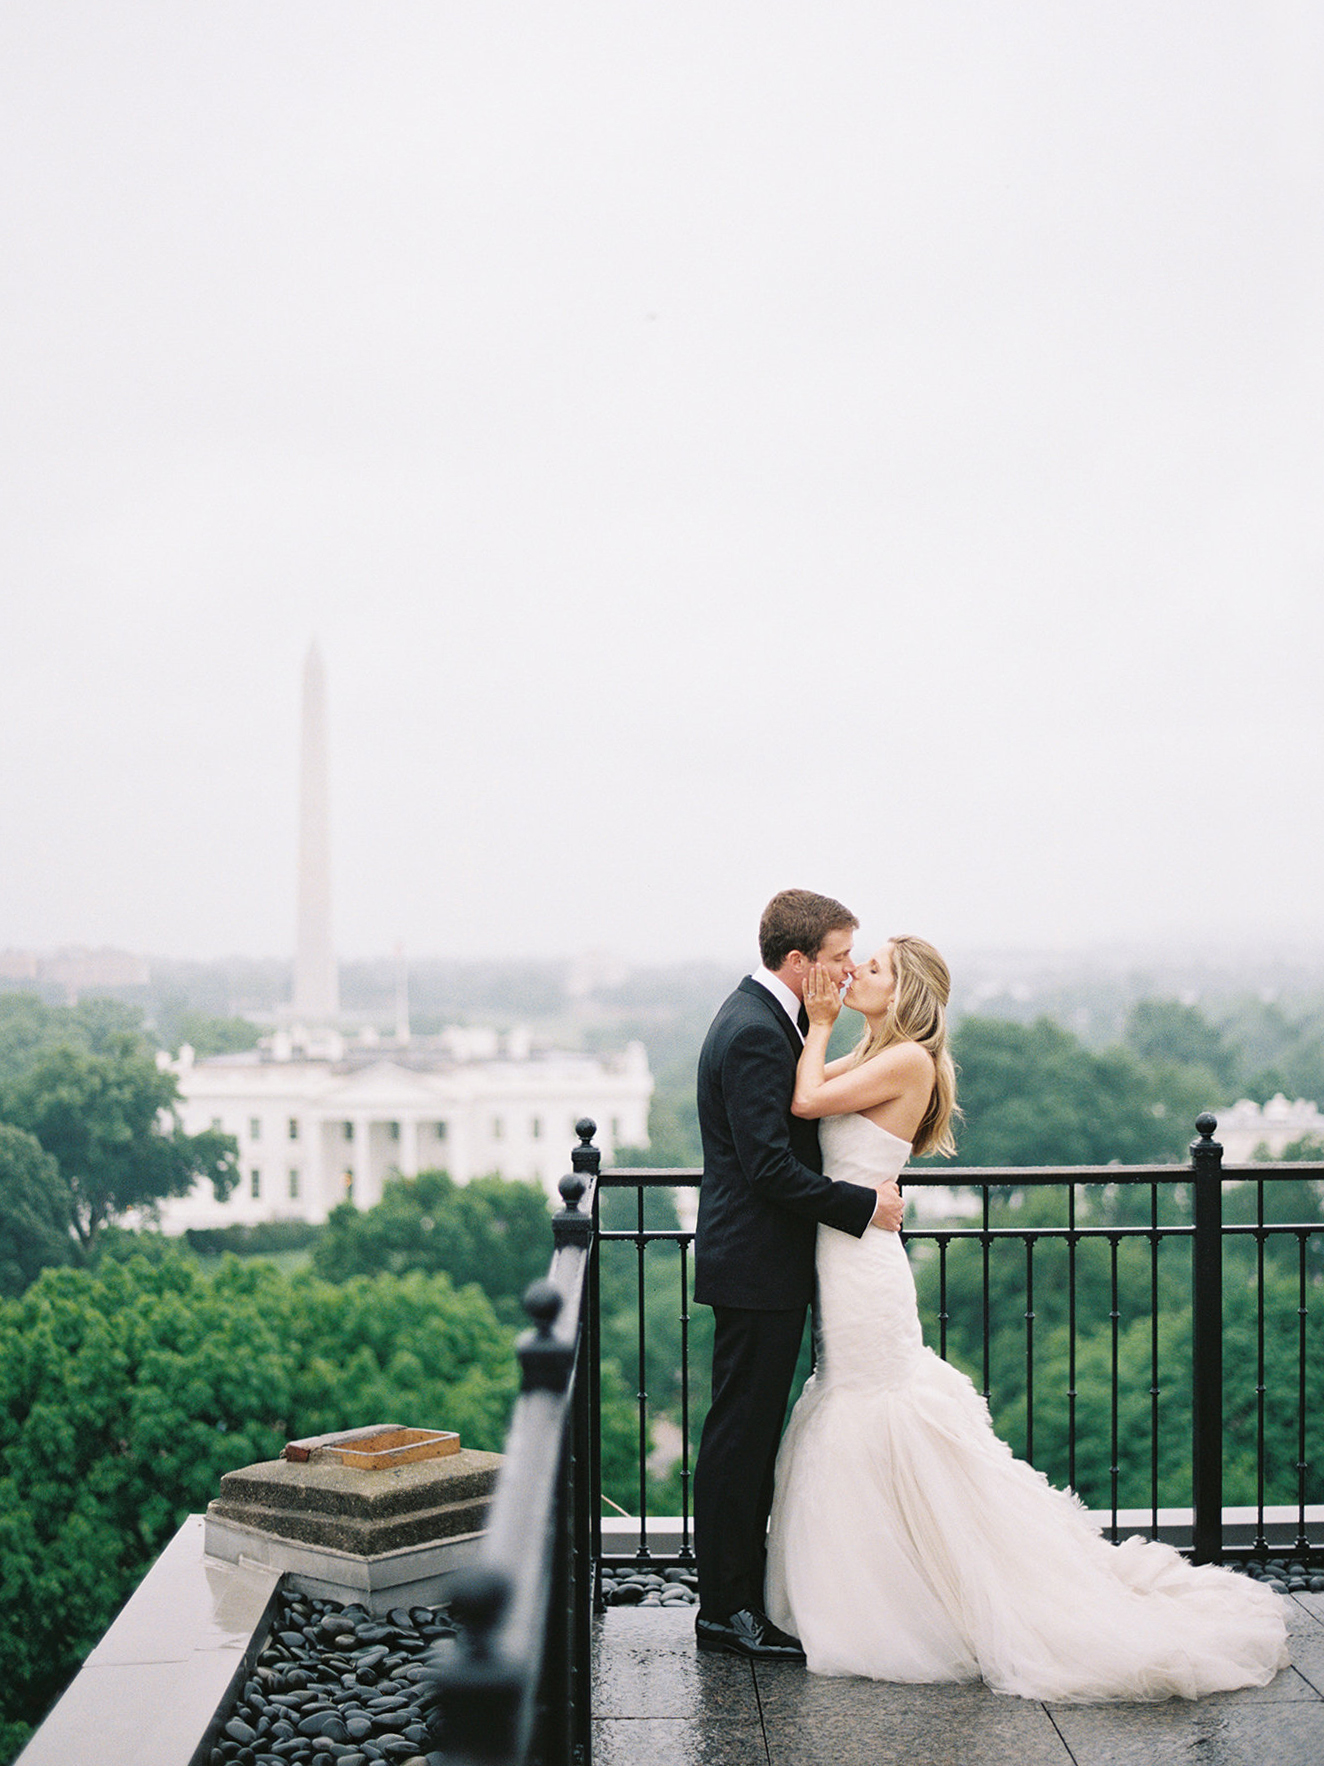 David & Hilary - Washington DC